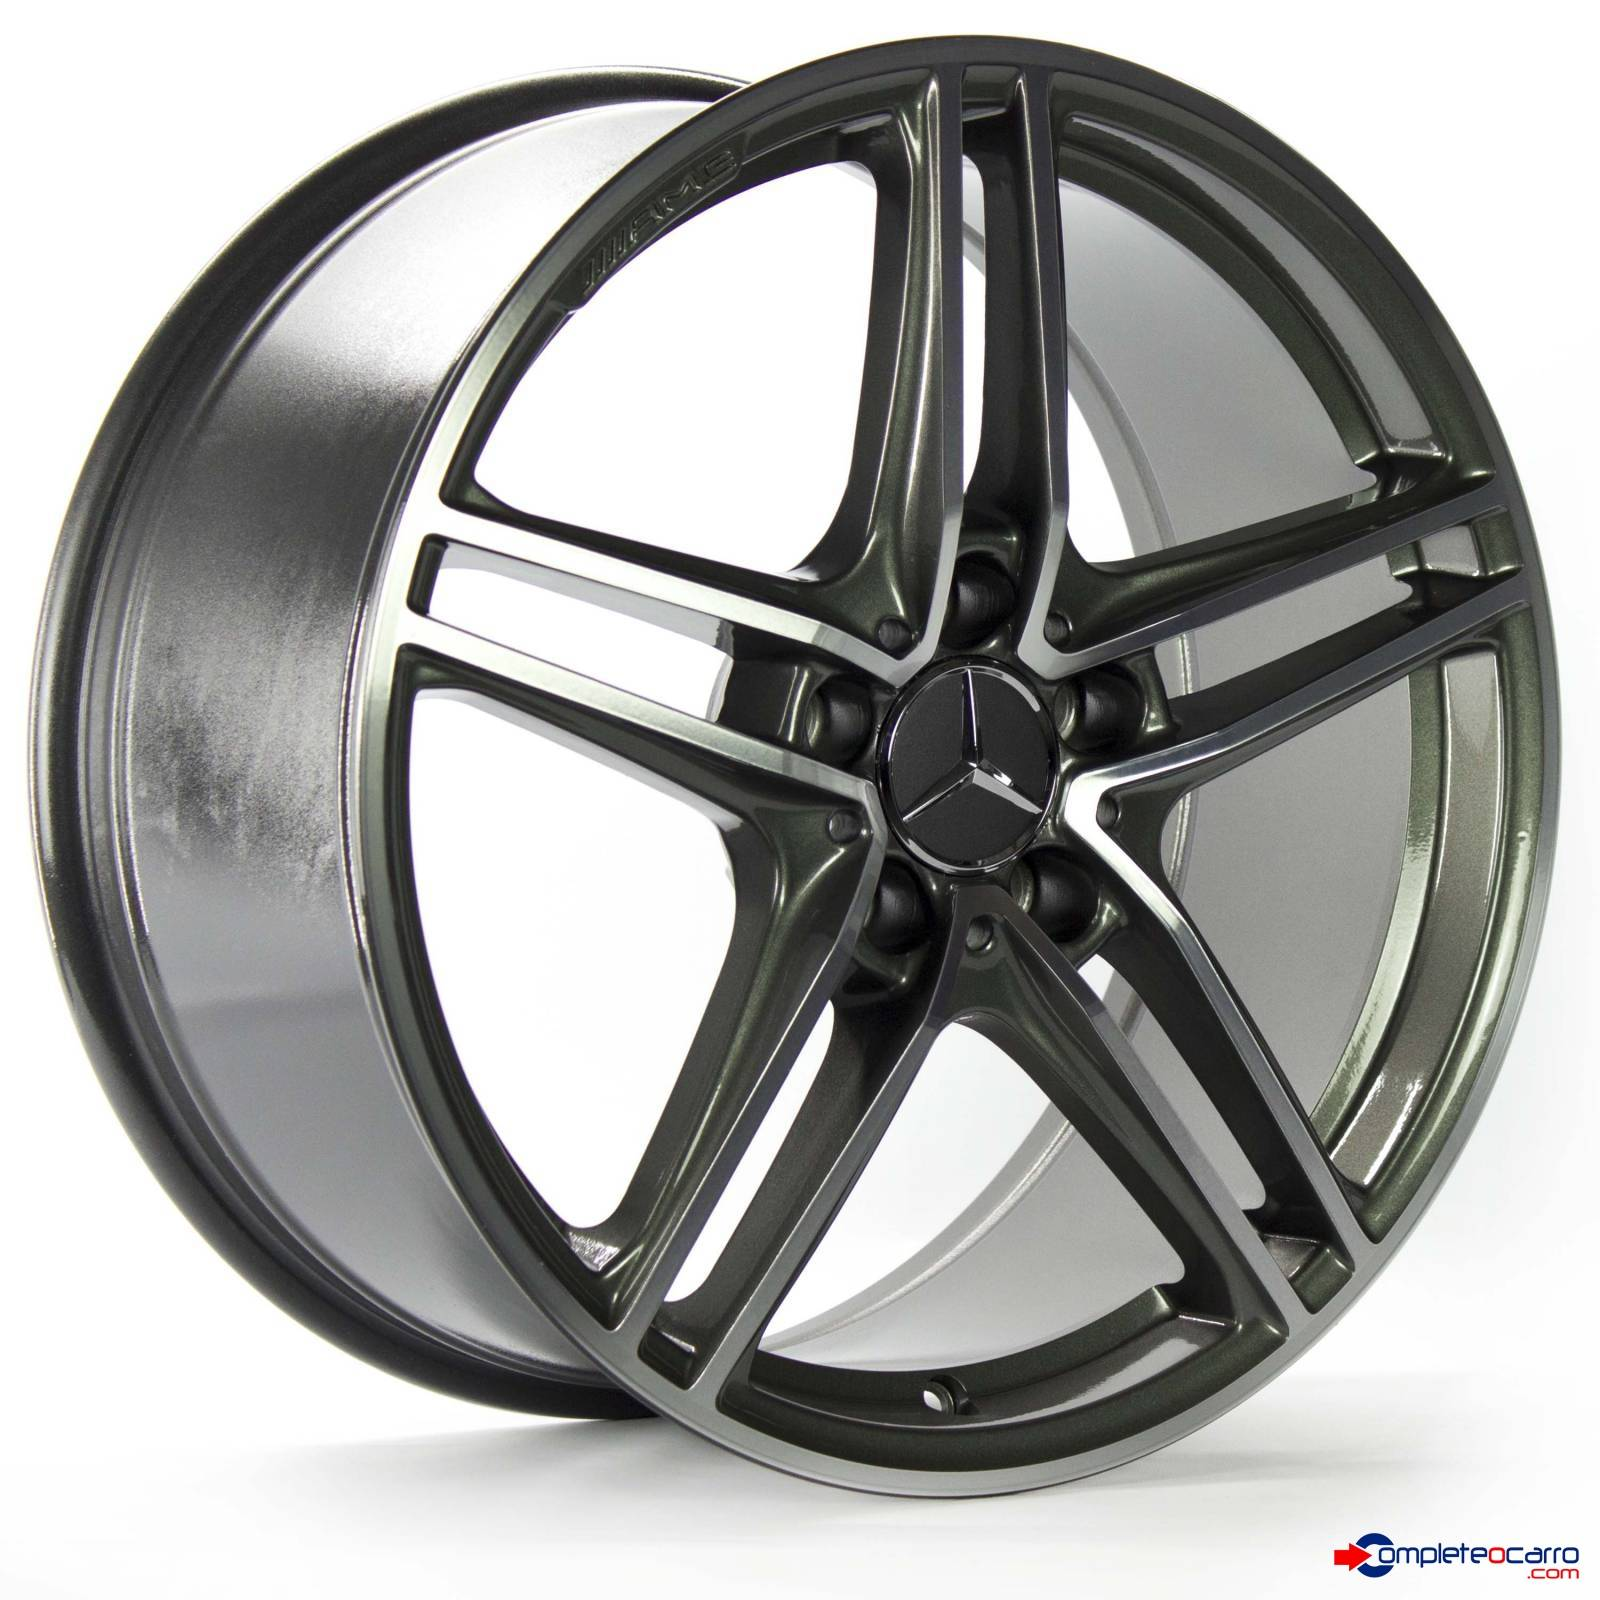 Jogo de Rodas Aro 18' 5x112 Mercedes AMG GT Roadster - DG -